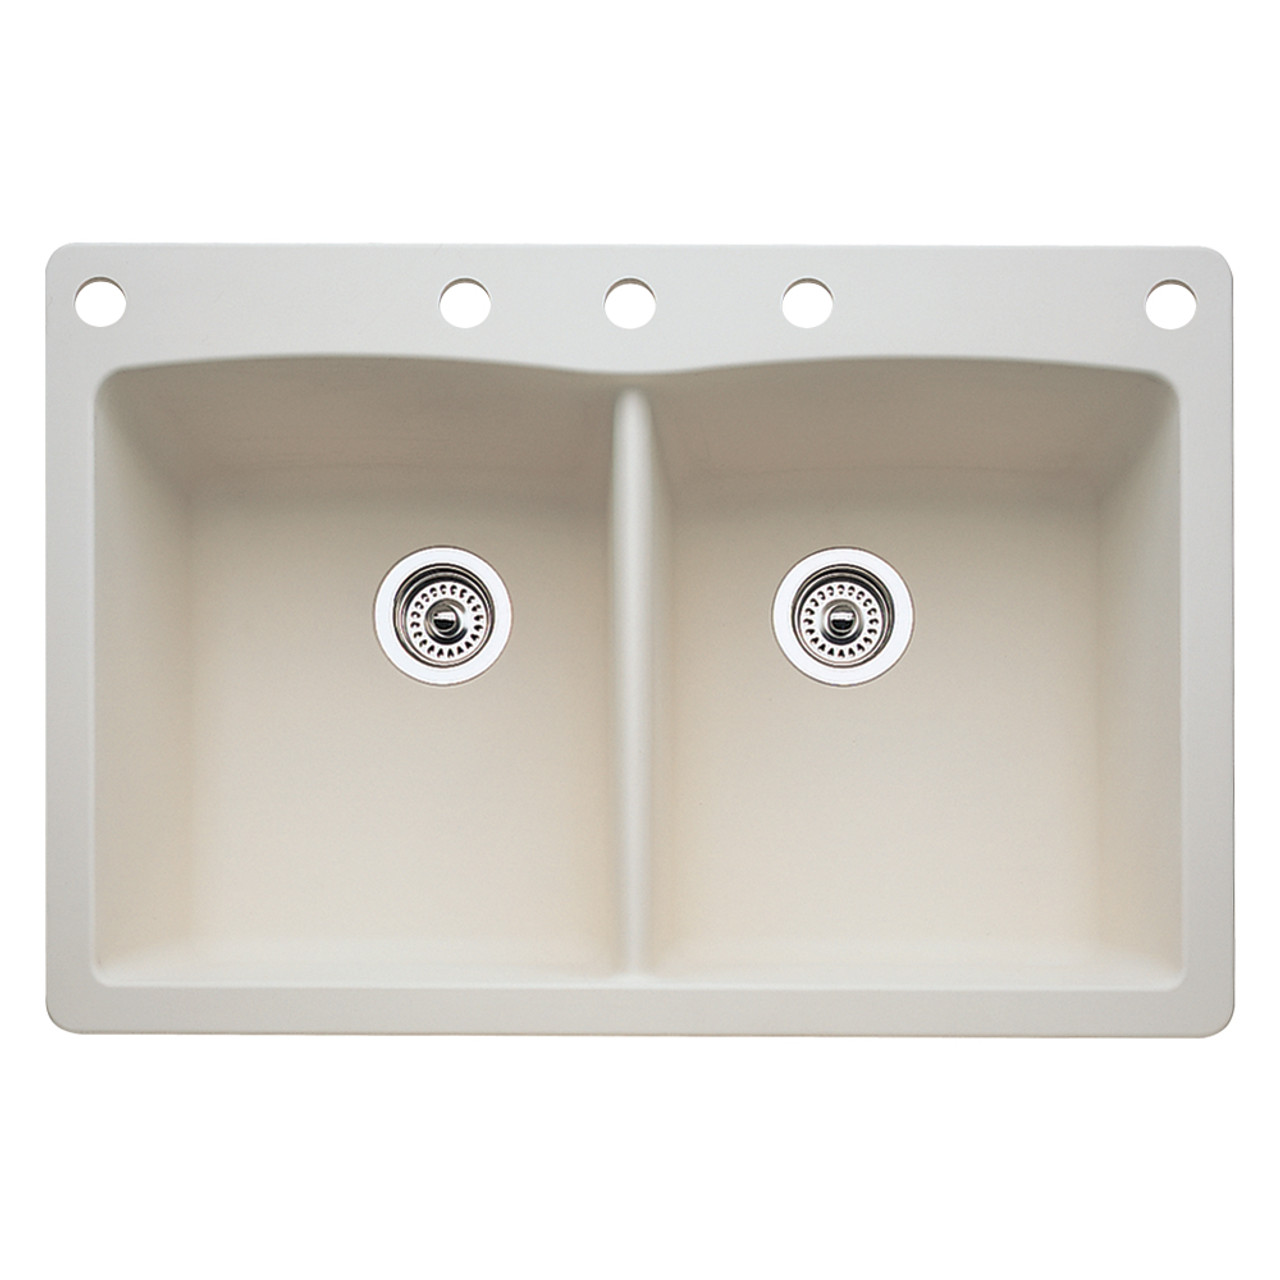 Blanco 441285-5 Diamond 5-Hole Double-Basin Drop-In Granite Kitchen Sink Truffle